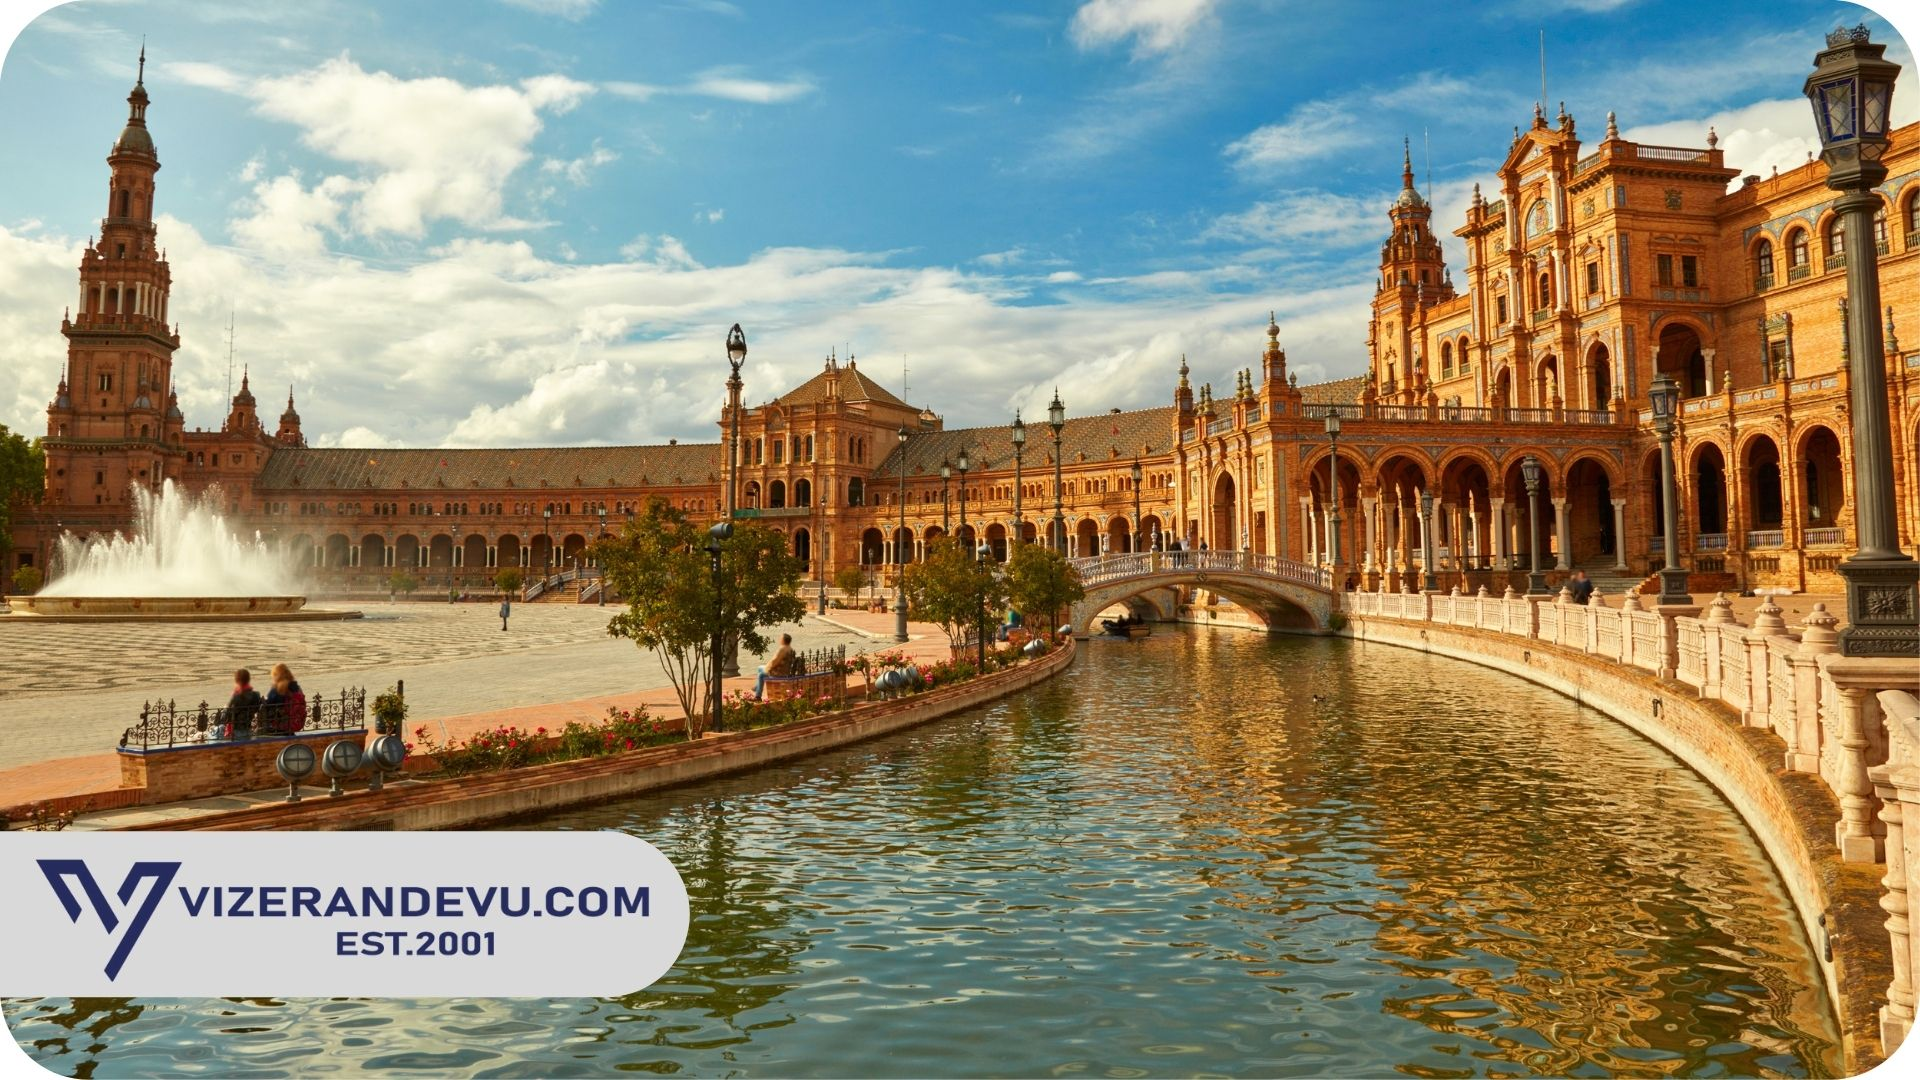 İspanya Turist / Ziyaretçi Vizesi